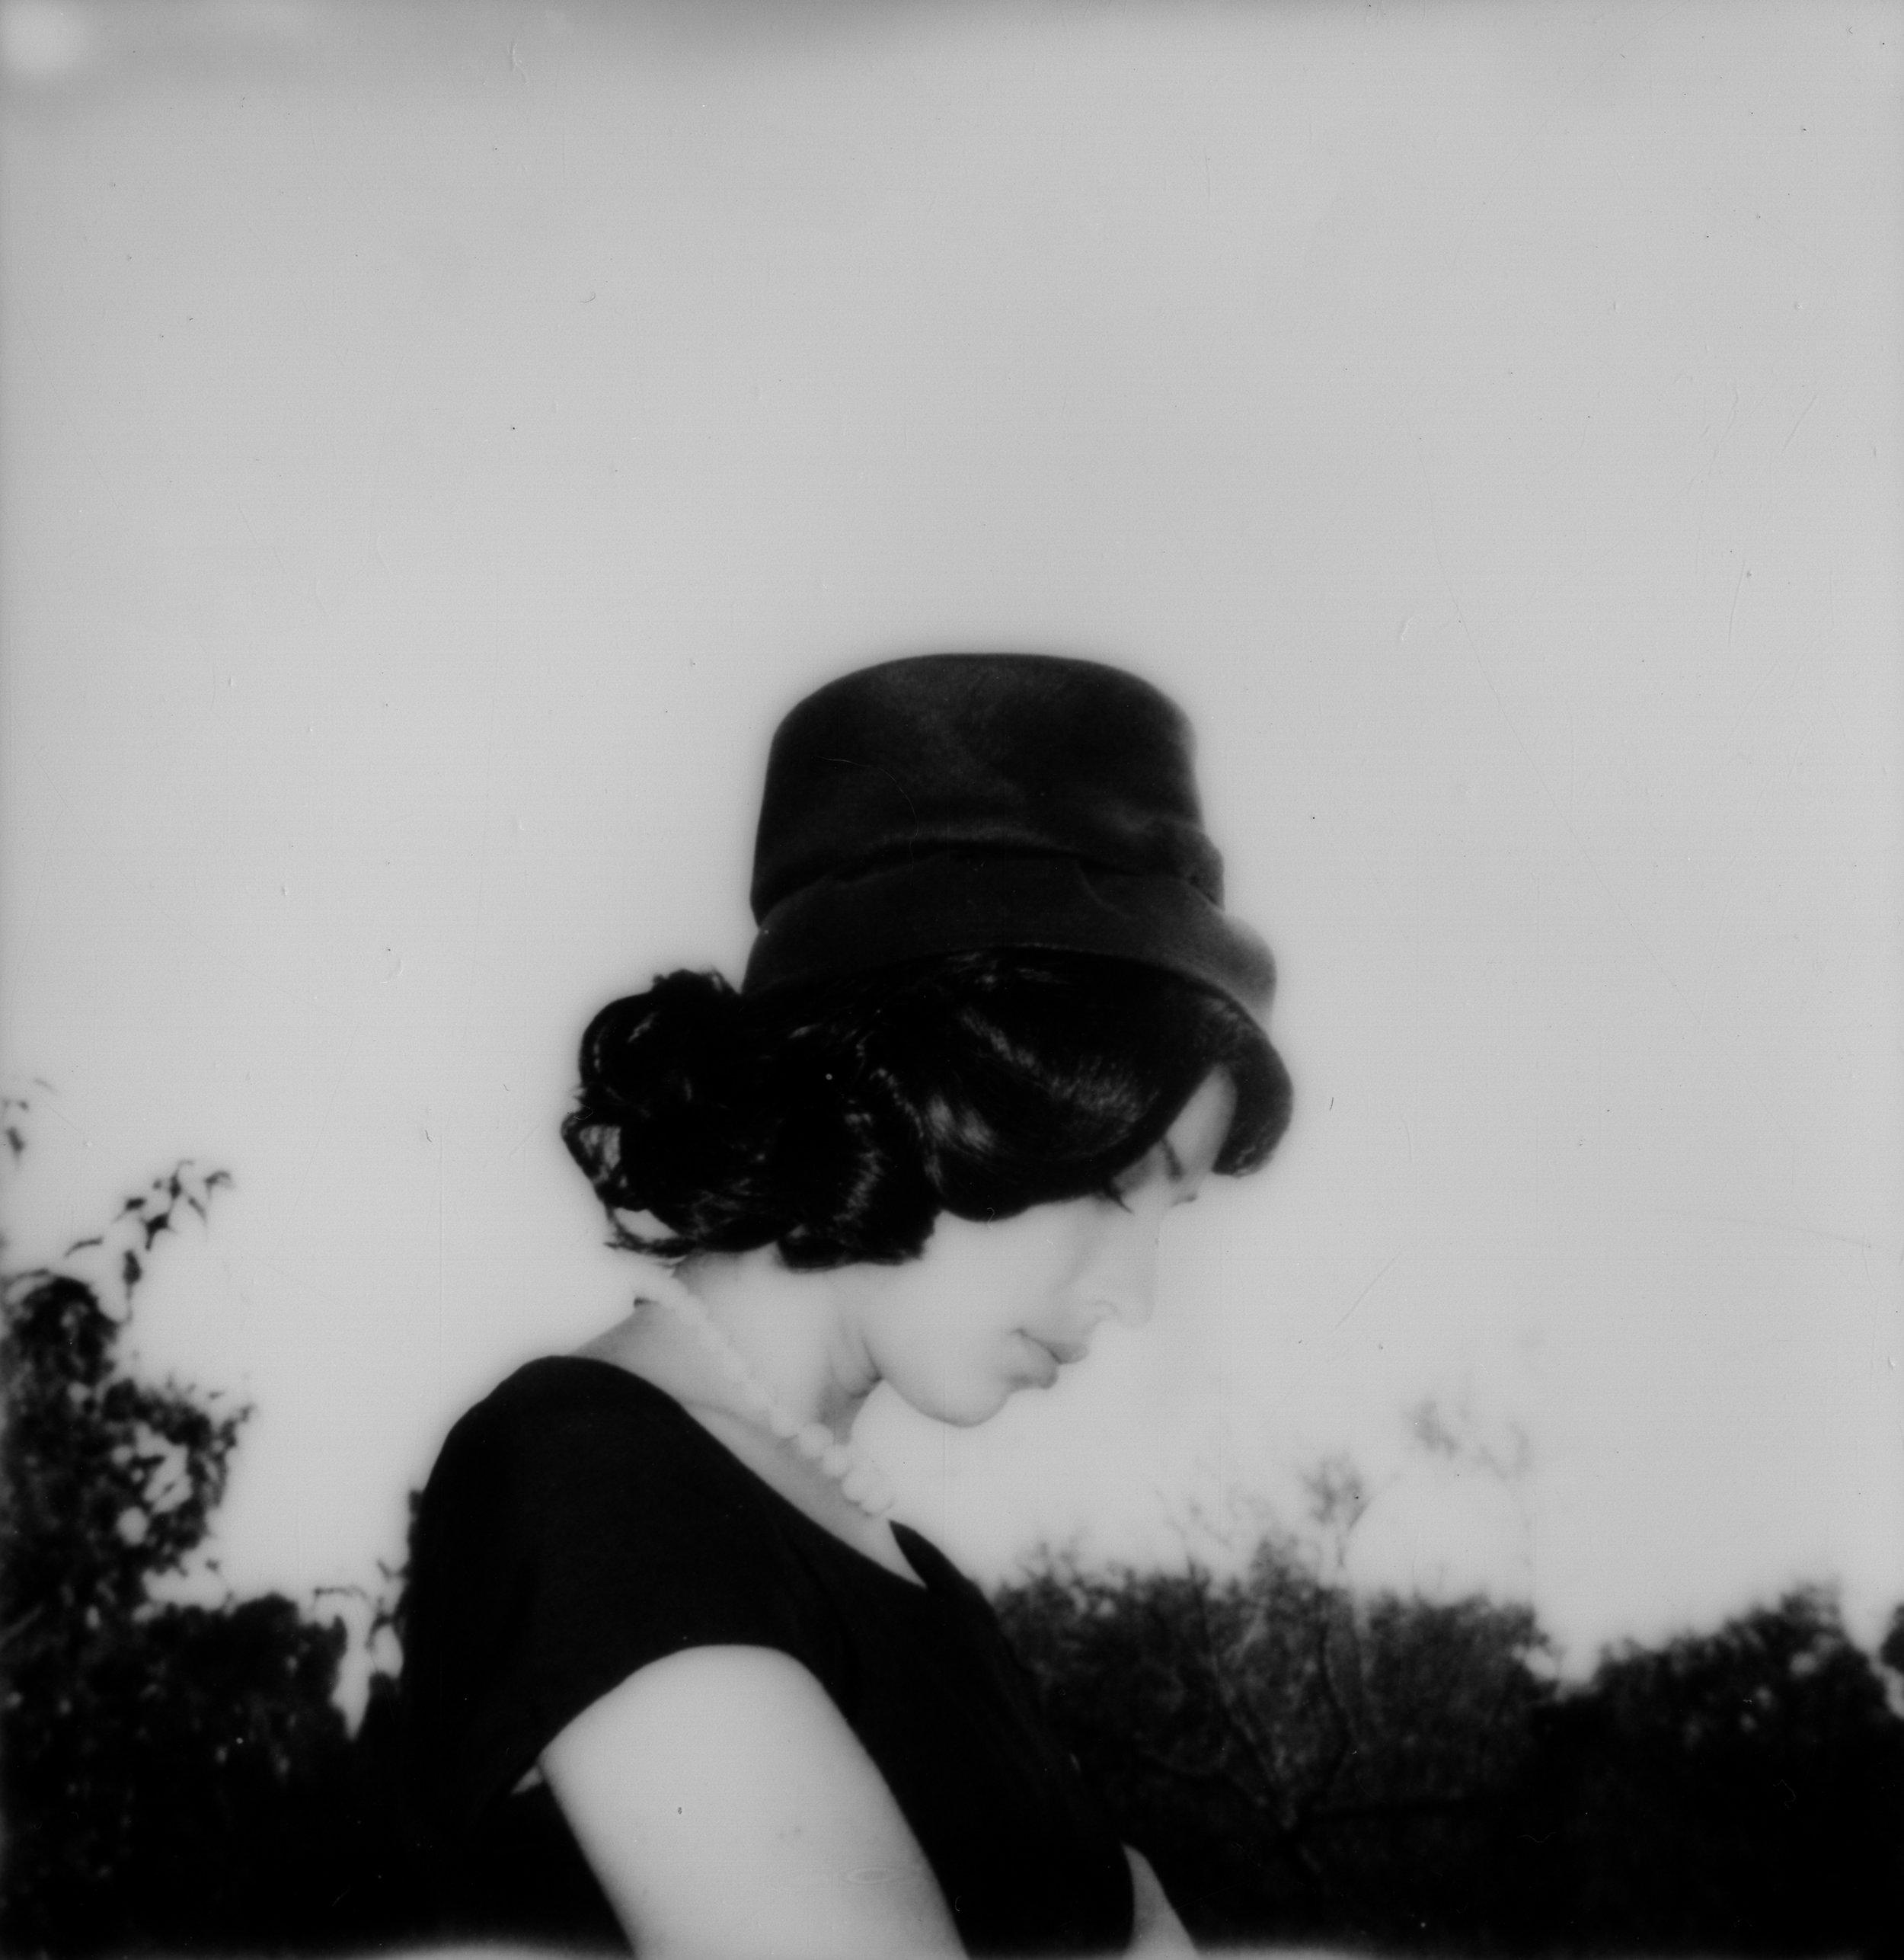 Arlington_PolaroidScan_30.jpg